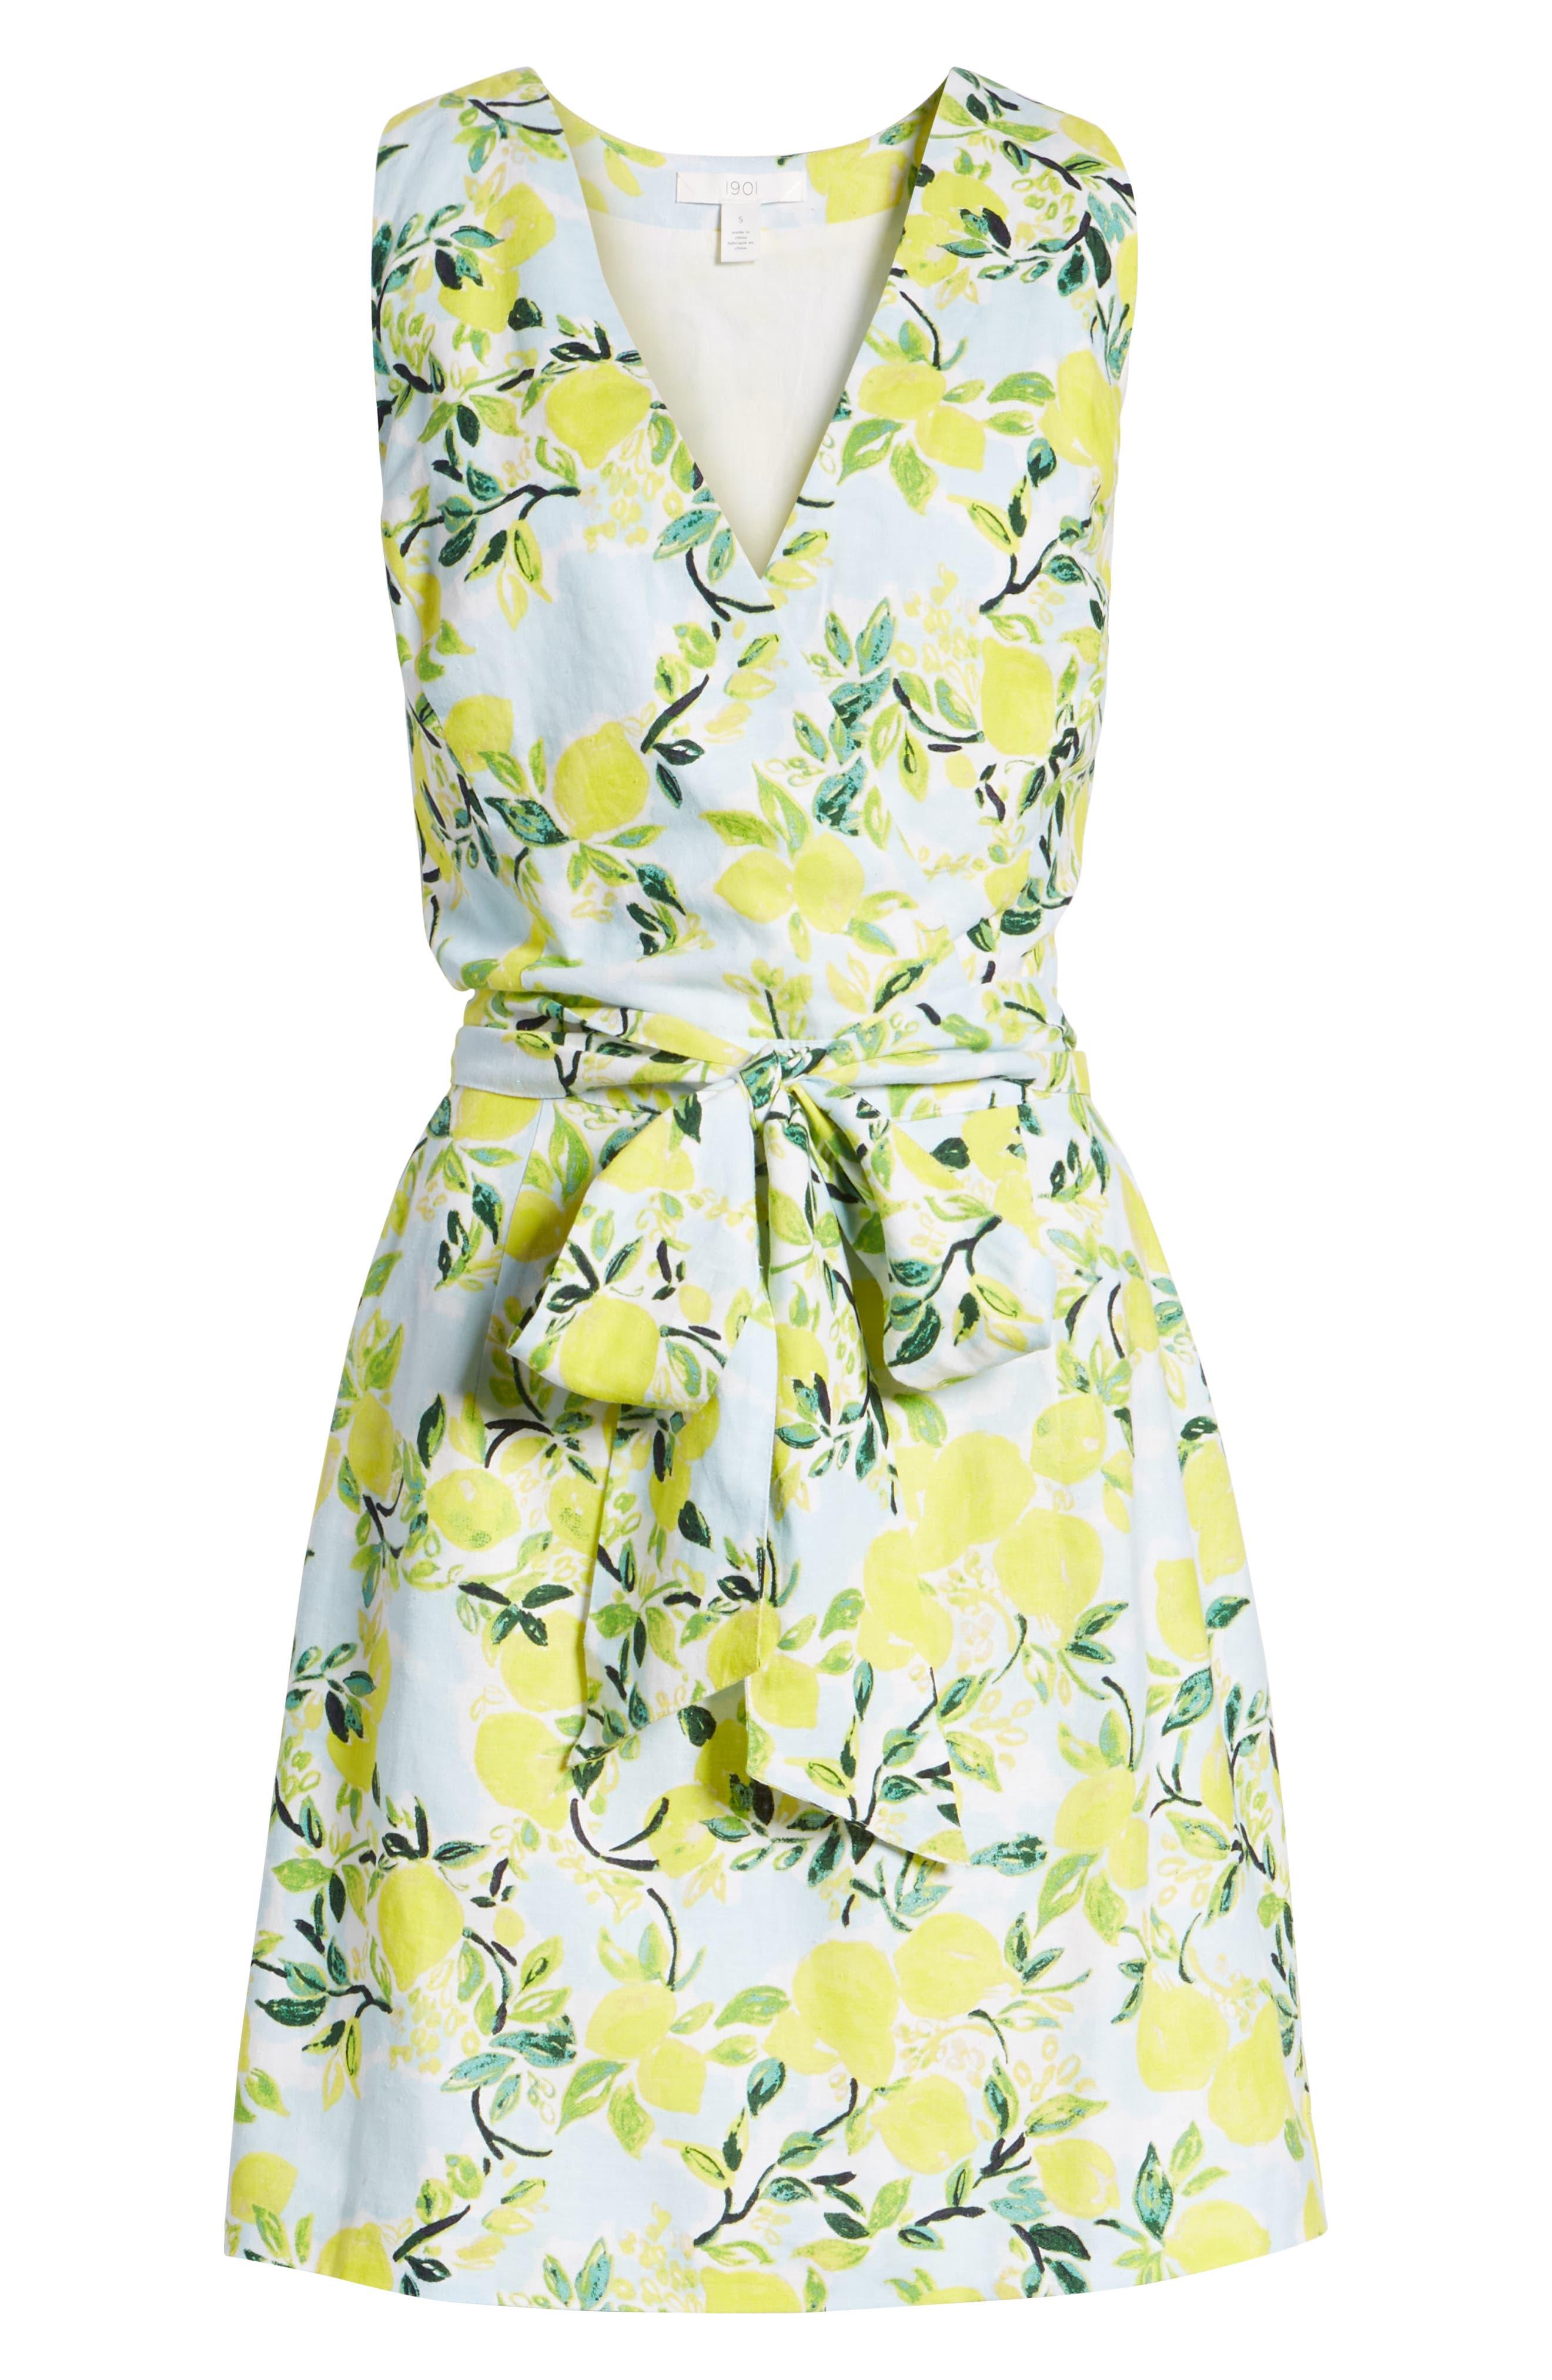 Tie Front Lemon Print Mini Dress,                             Alternate thumbnail 7, color,                             Blue- Yellow Citrus Print